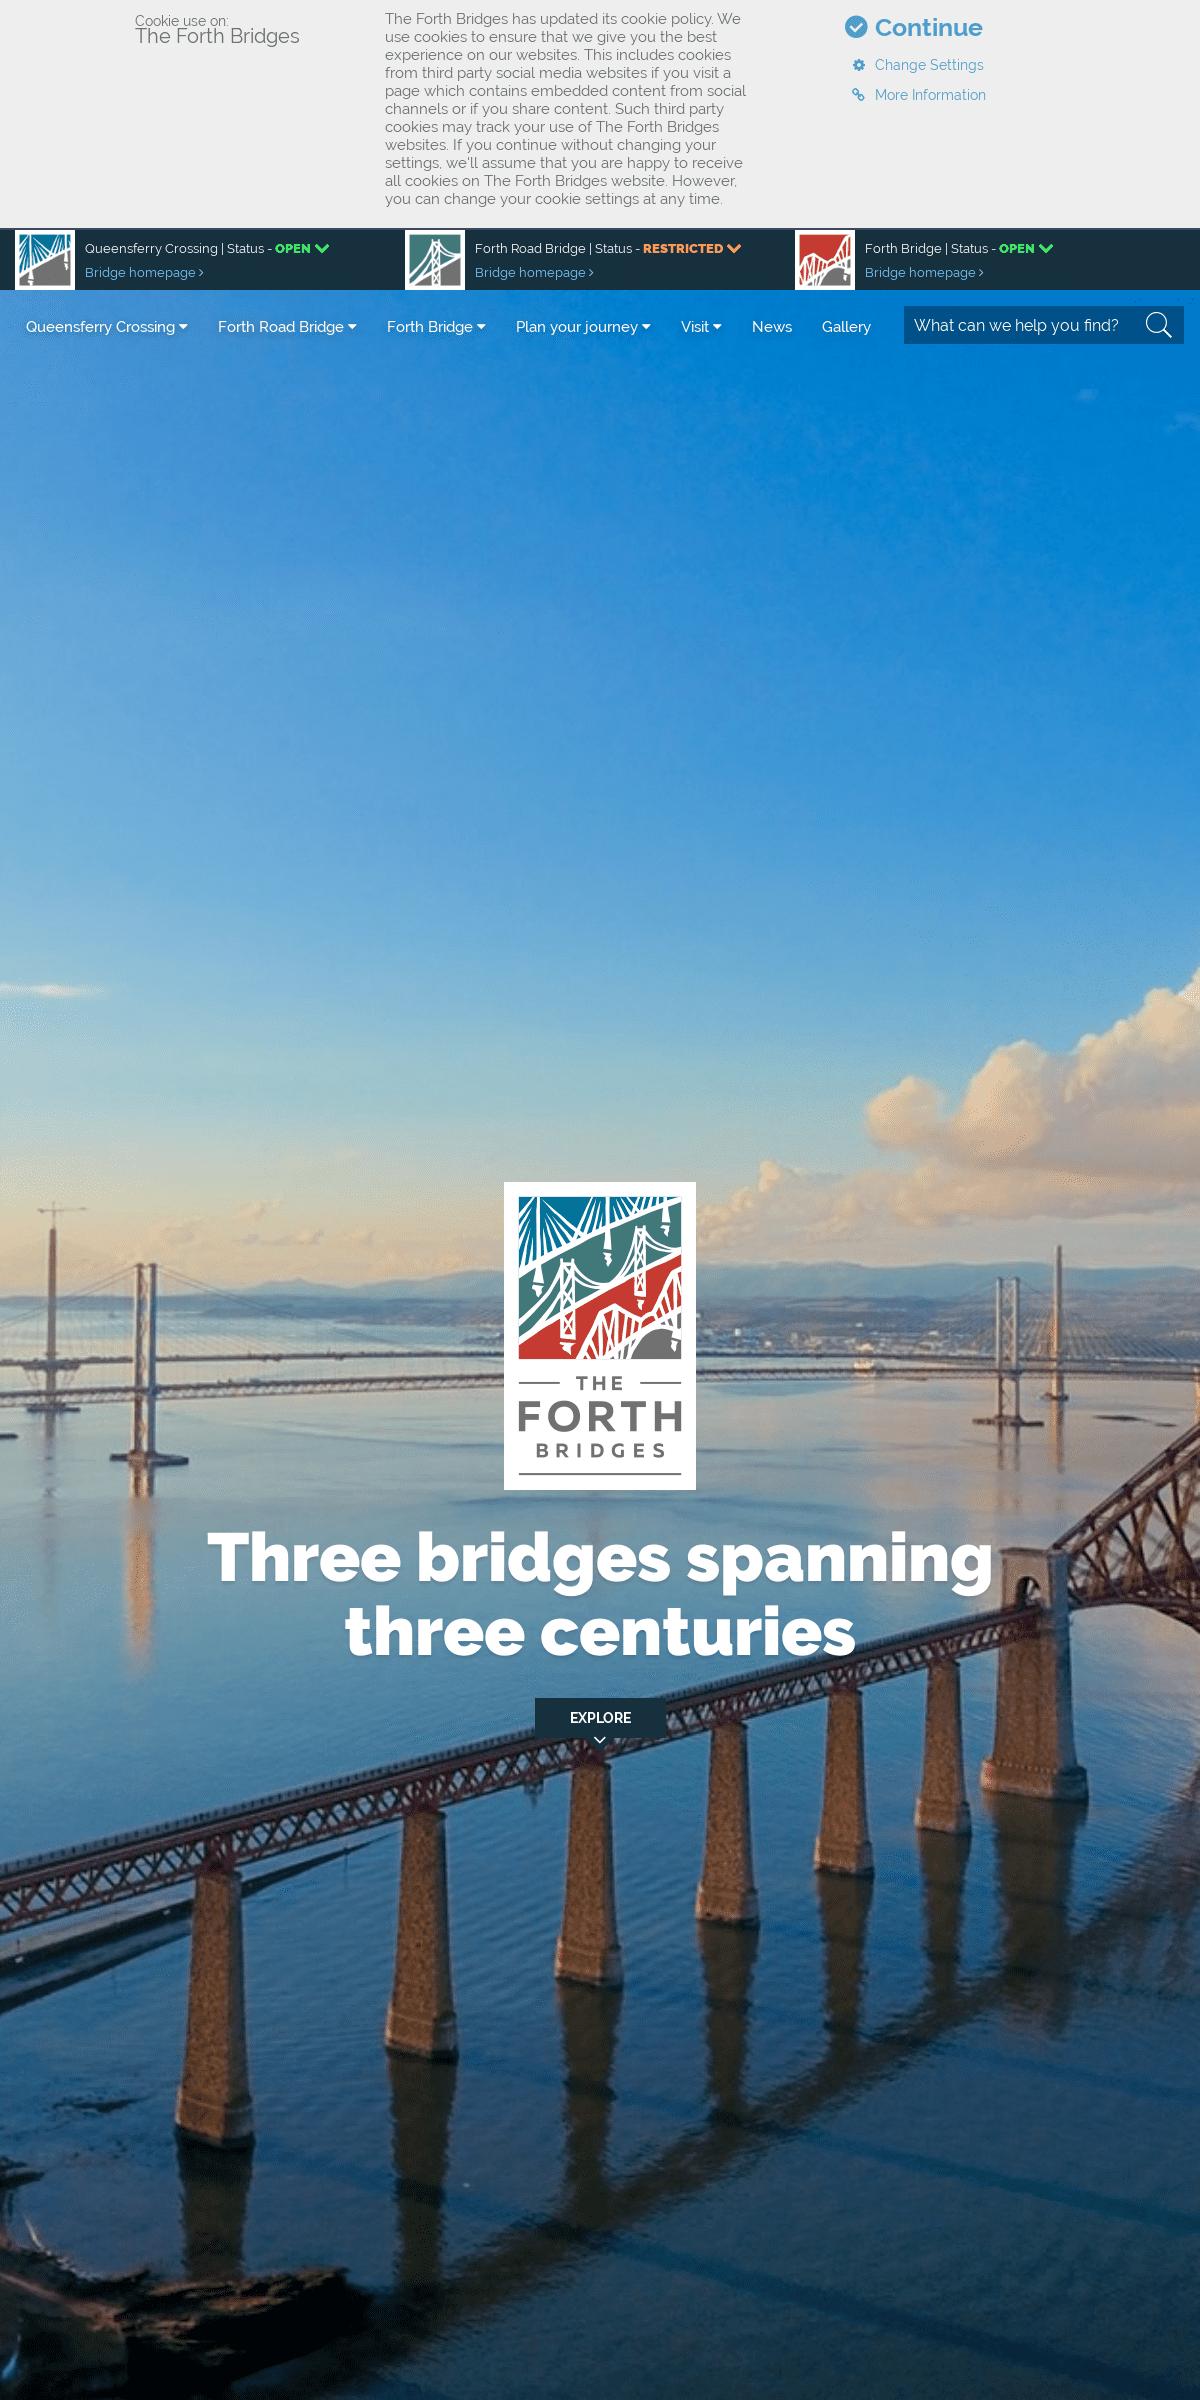 The Forth Bridges - The Forth Bridges